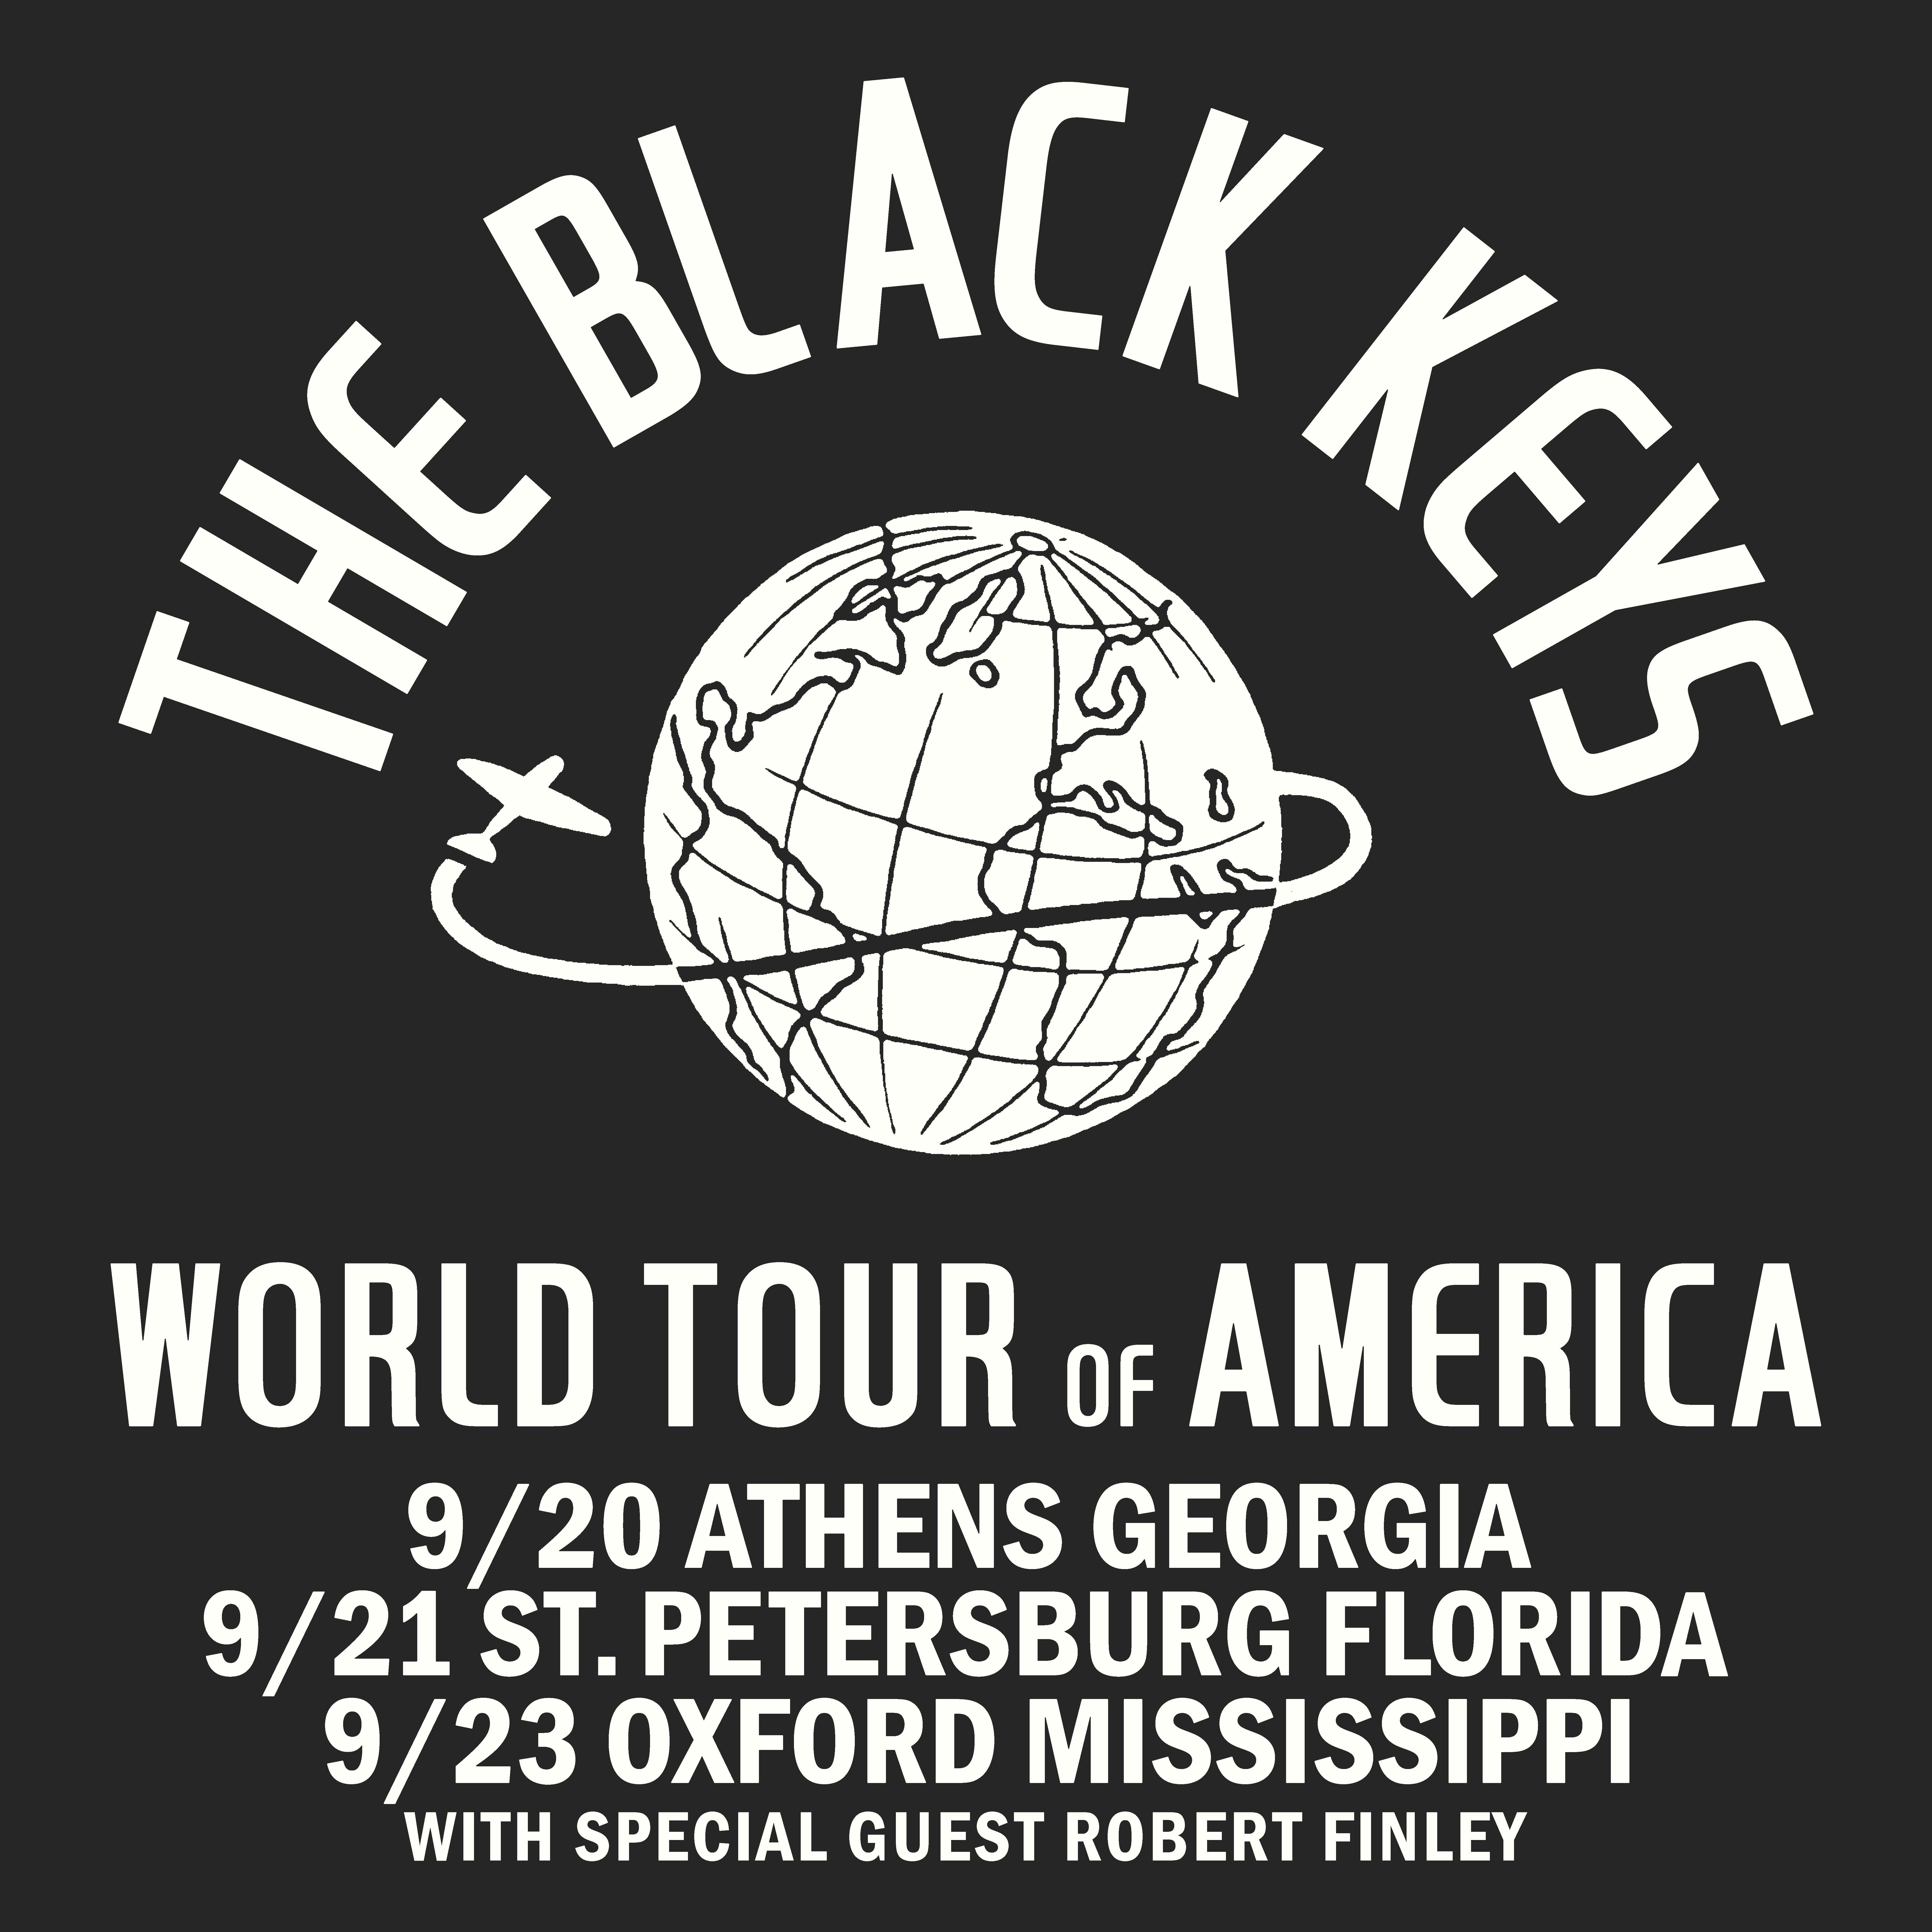 The Black Keys Announce World Tour Of America